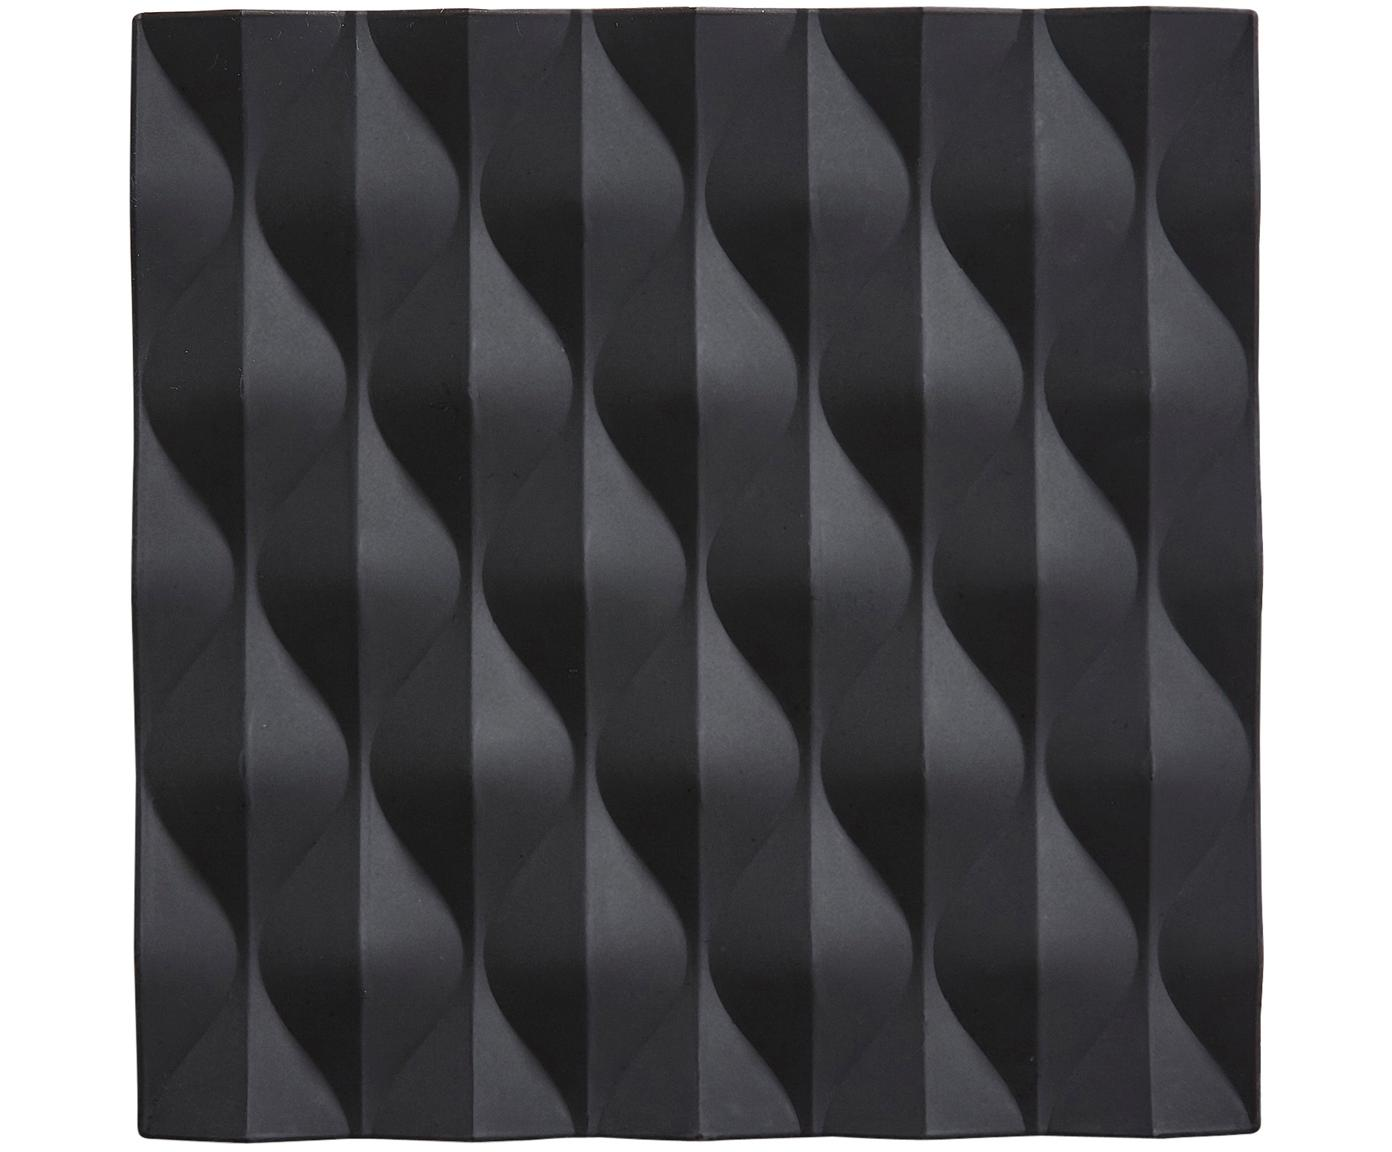 Salvamanteles Origami Wave, 2uds., Silicona, Negro, An 16x F 16 cm